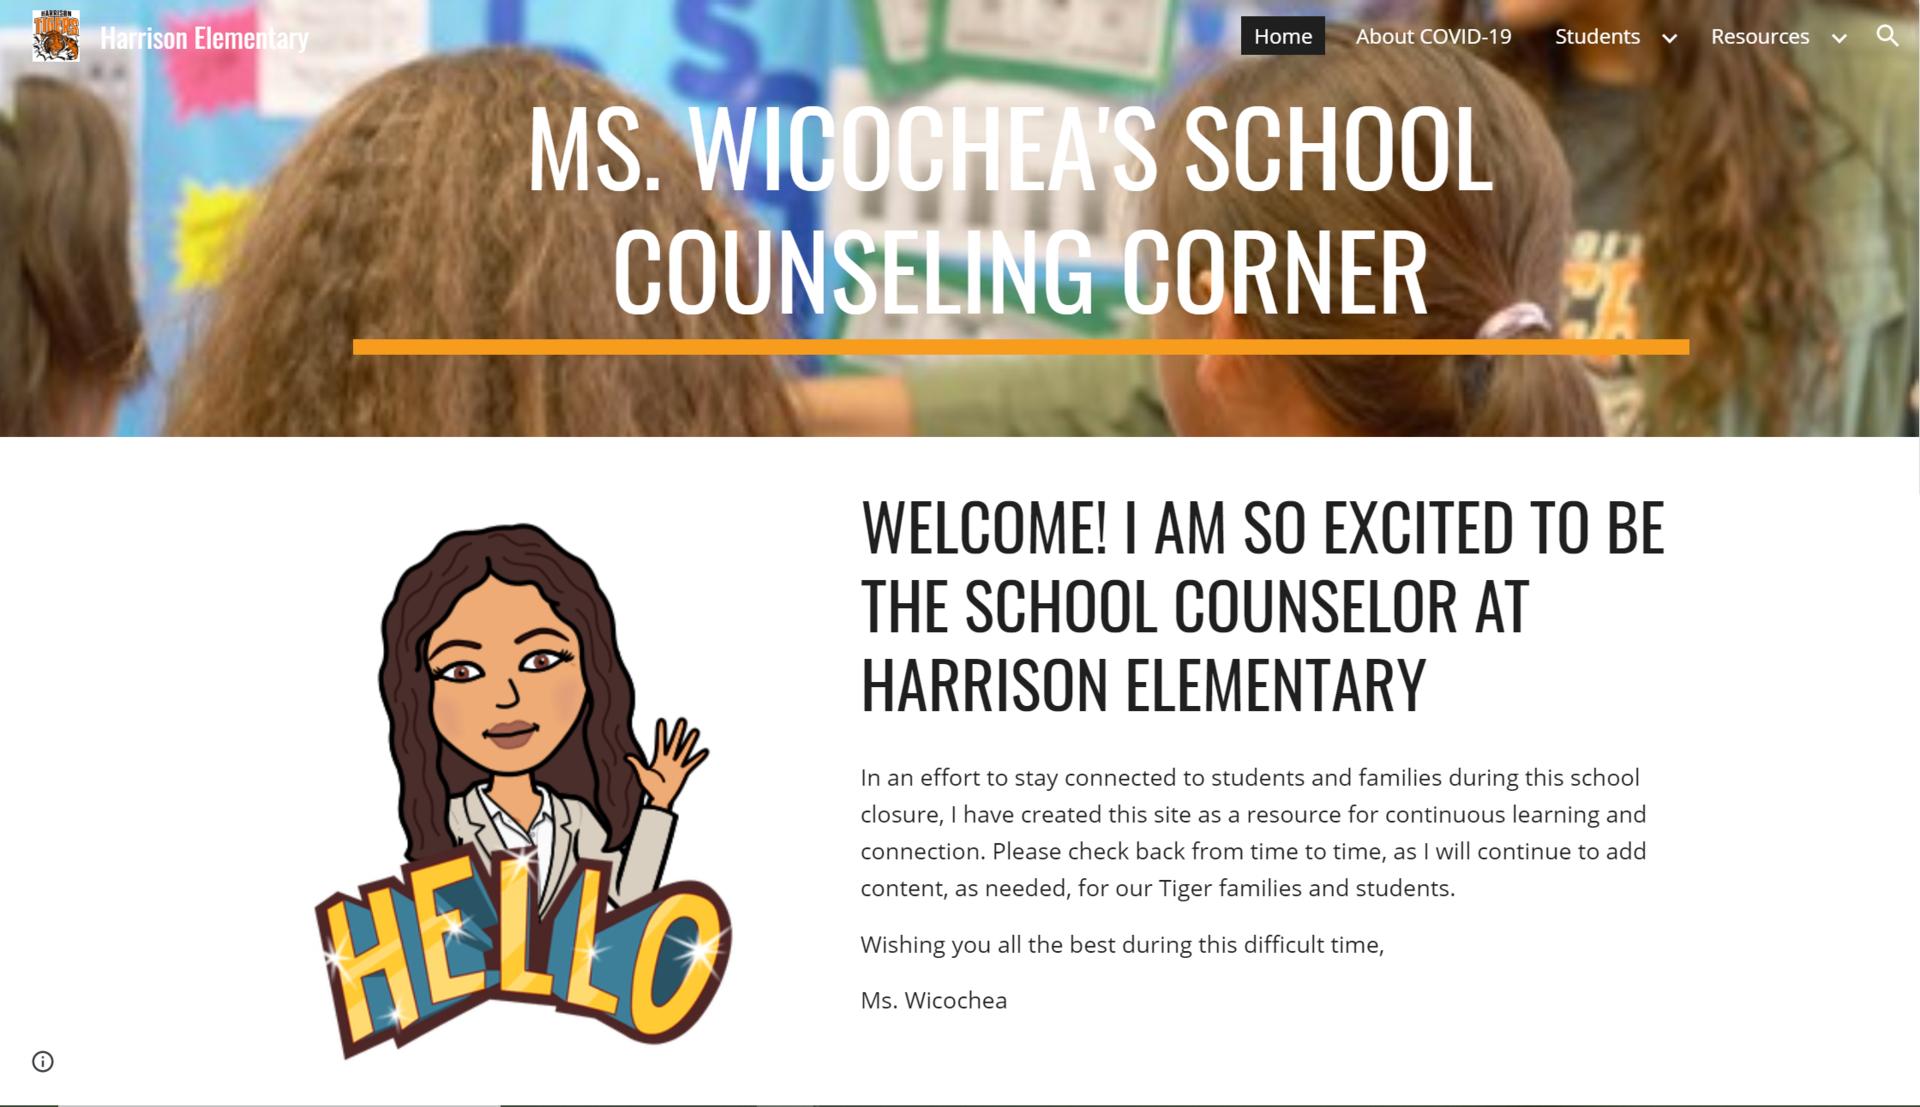 Ms. Wicochea's Counseling Corner